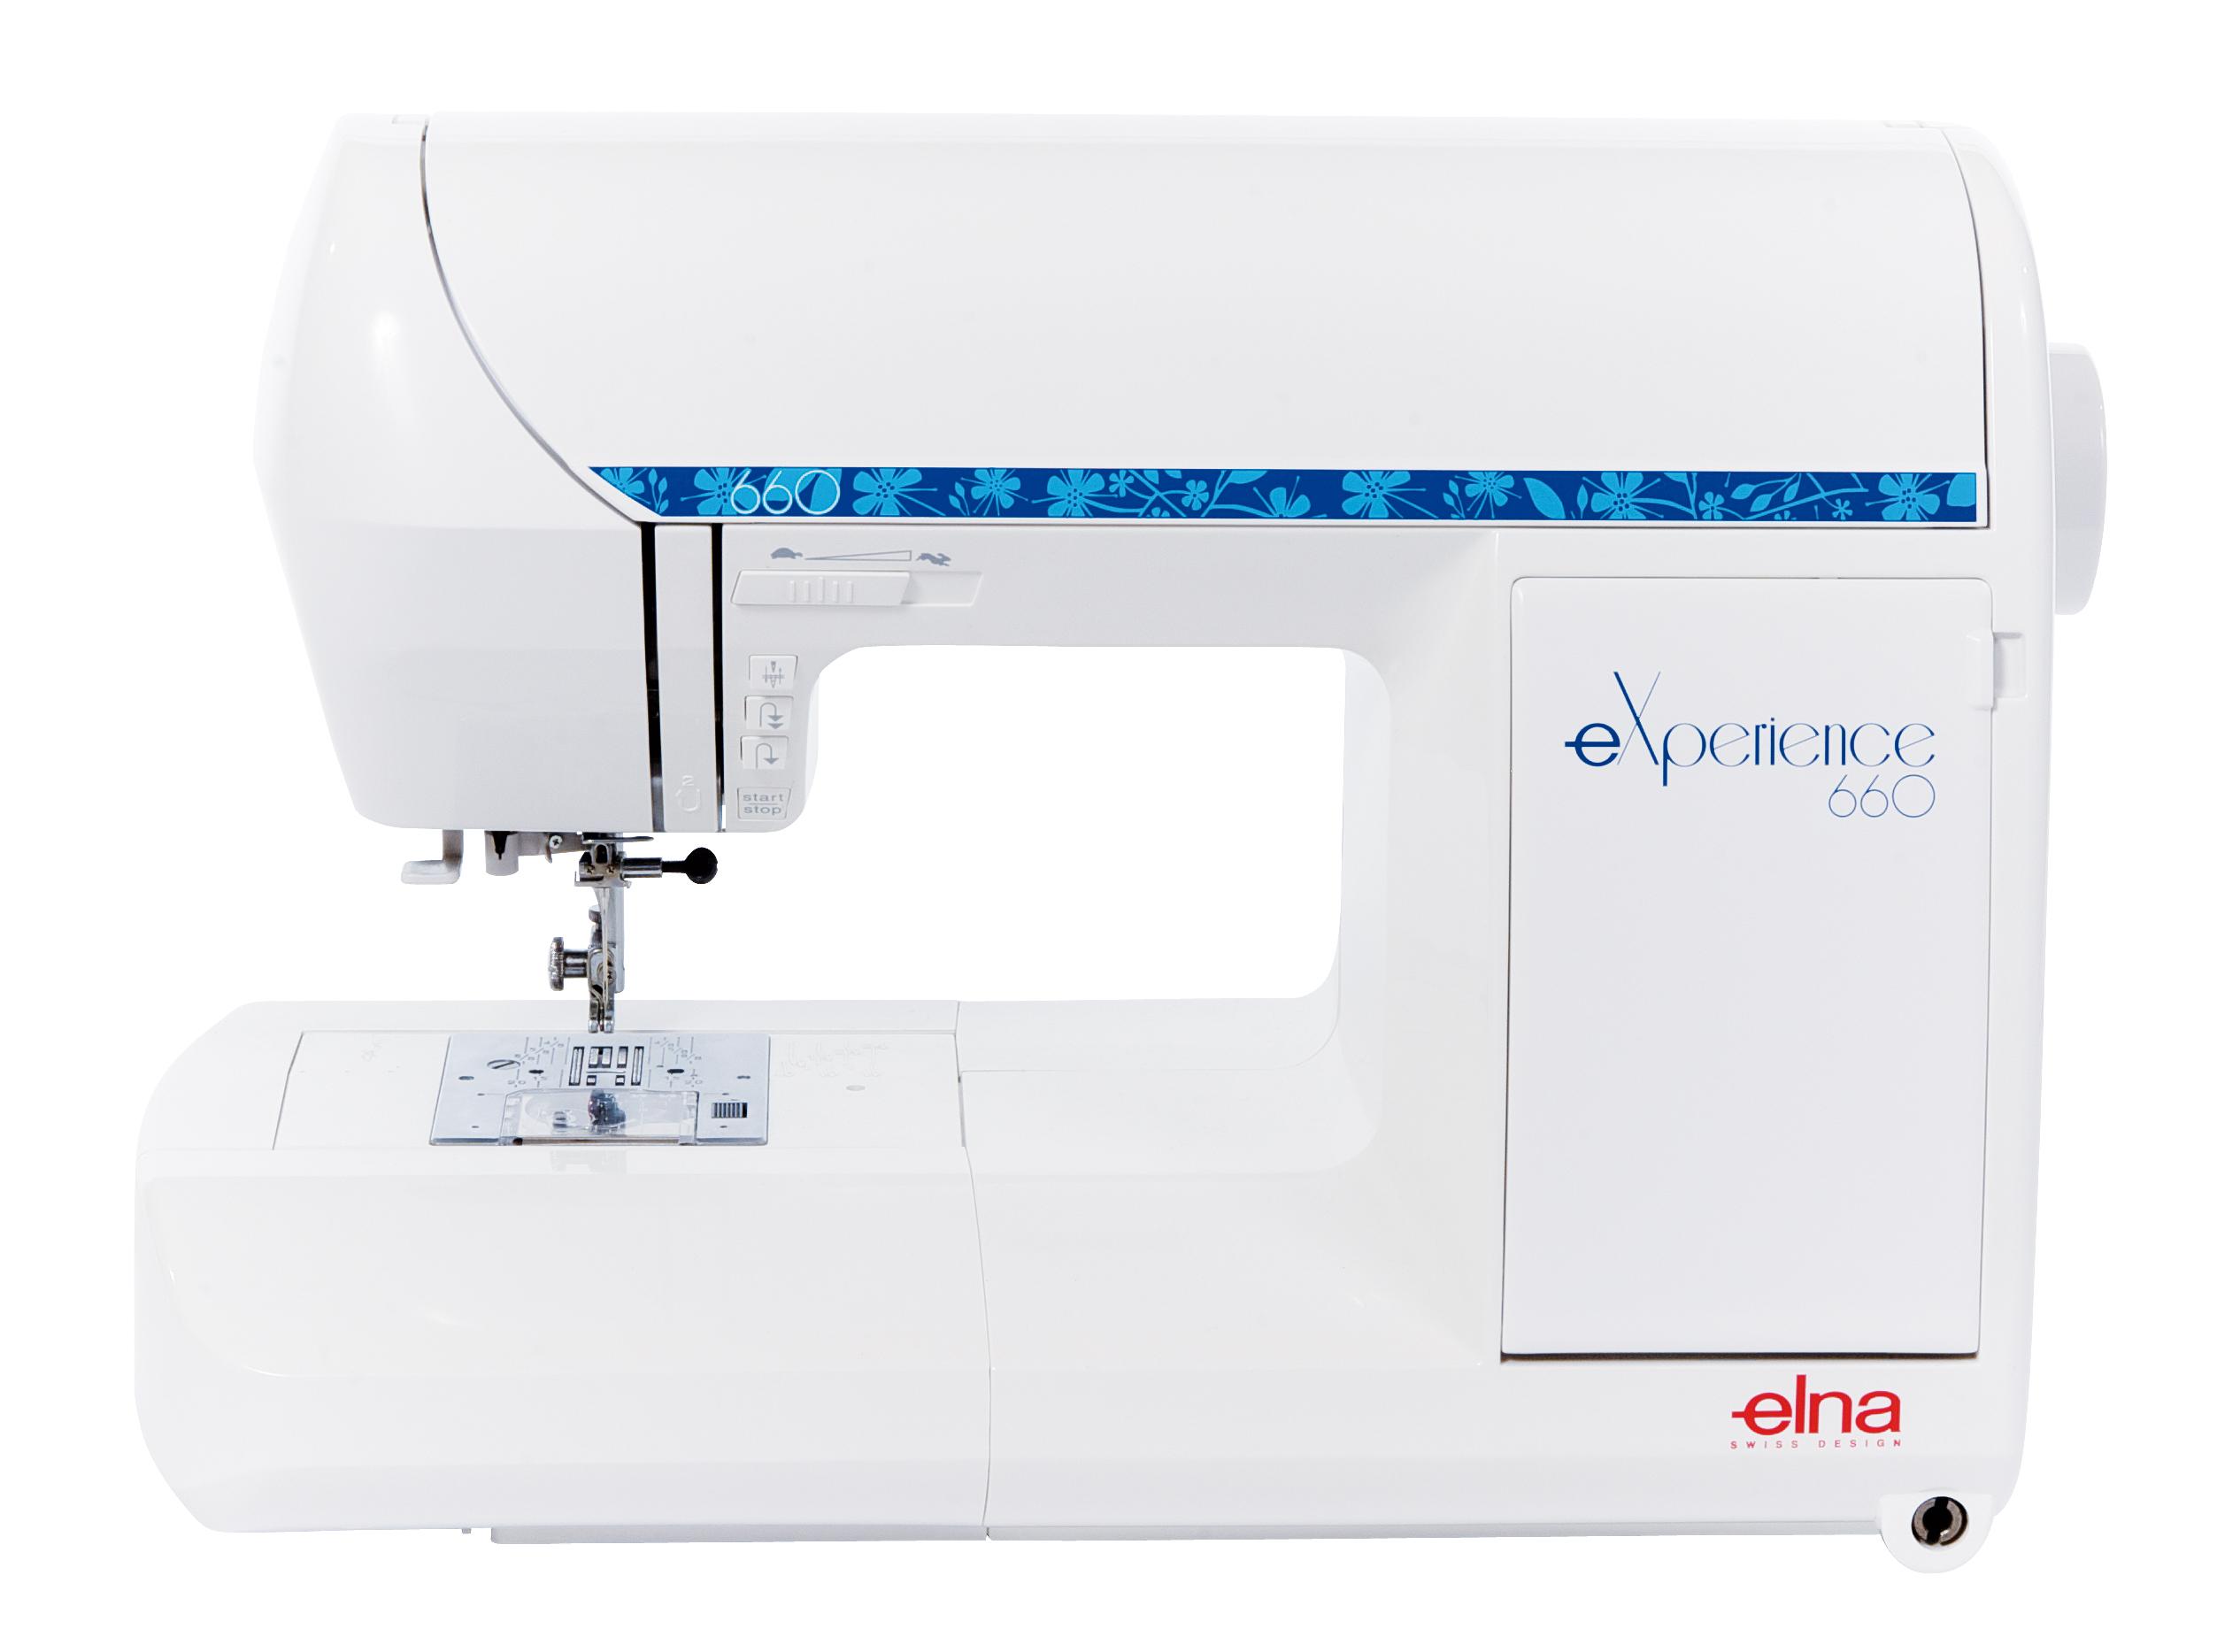 ELNA eXperience 660